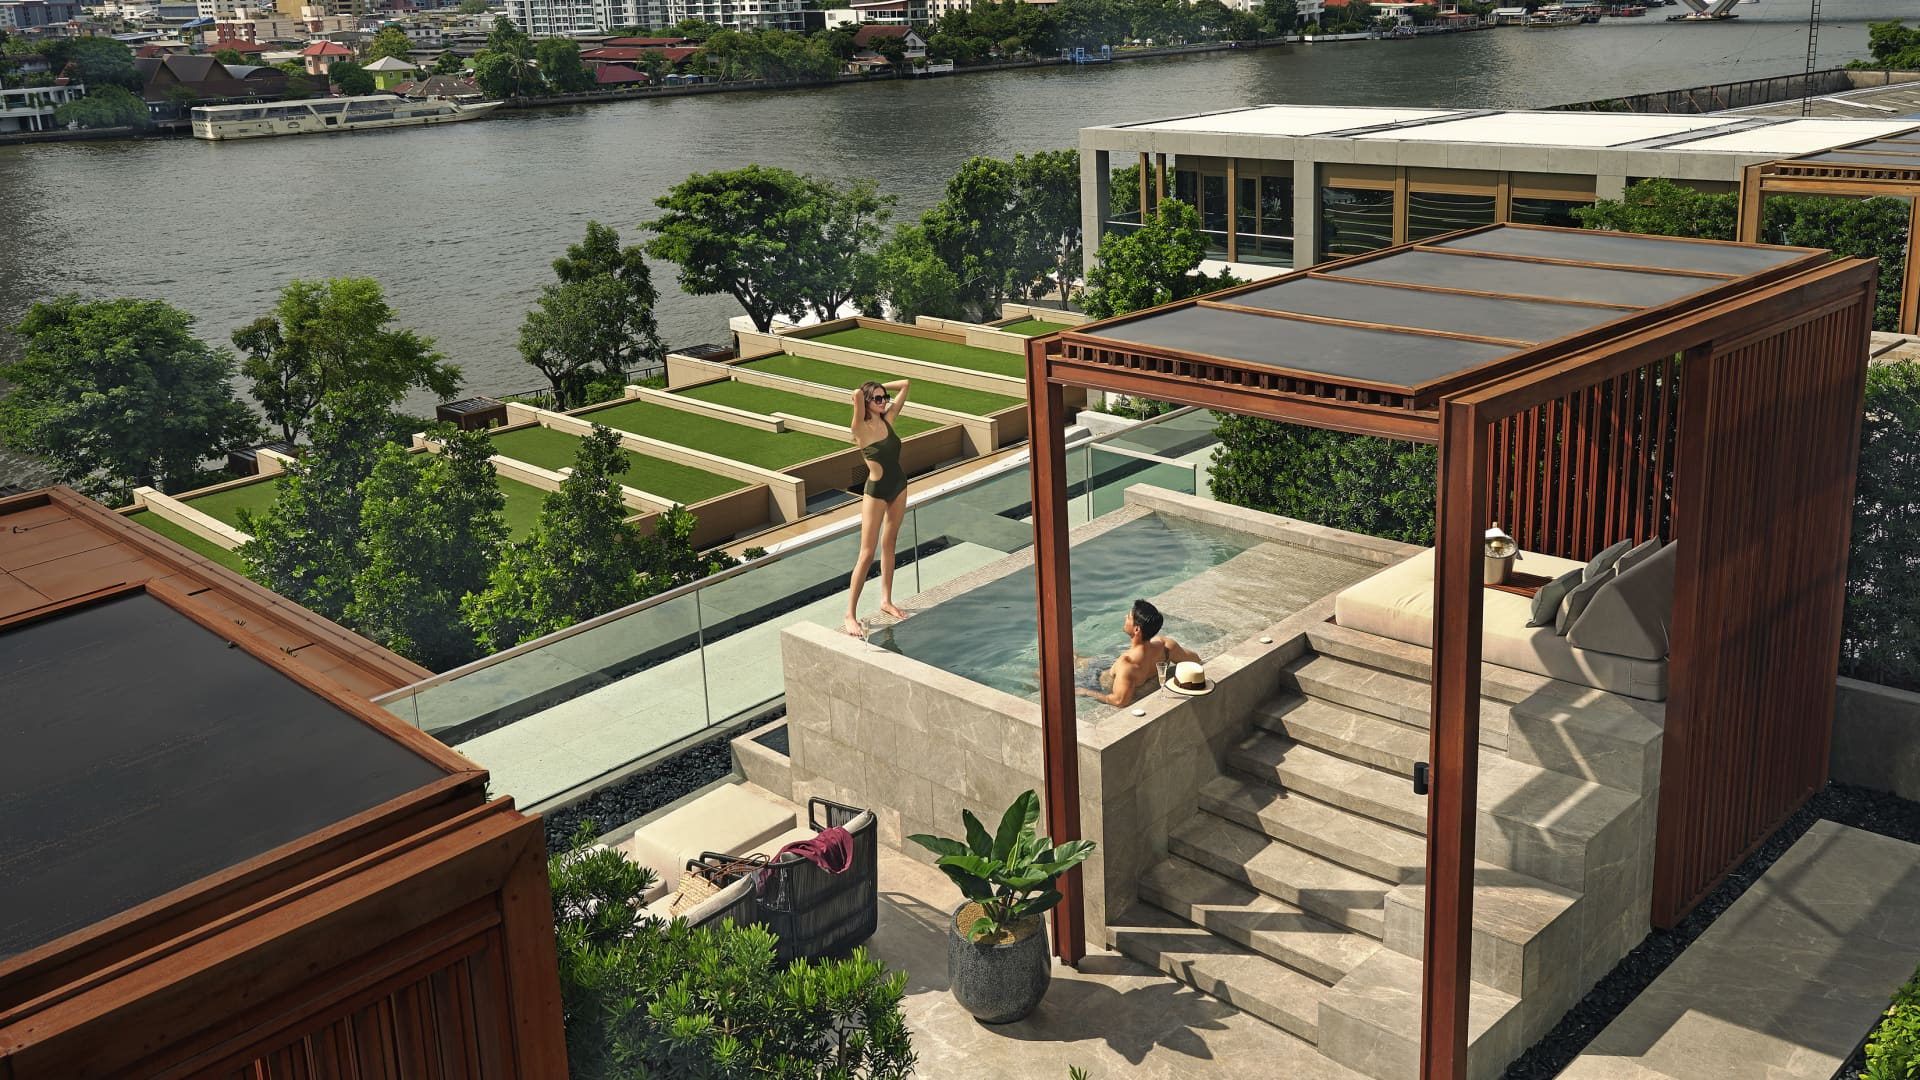 Capella Bangkok is located along the Chao Phraya River.